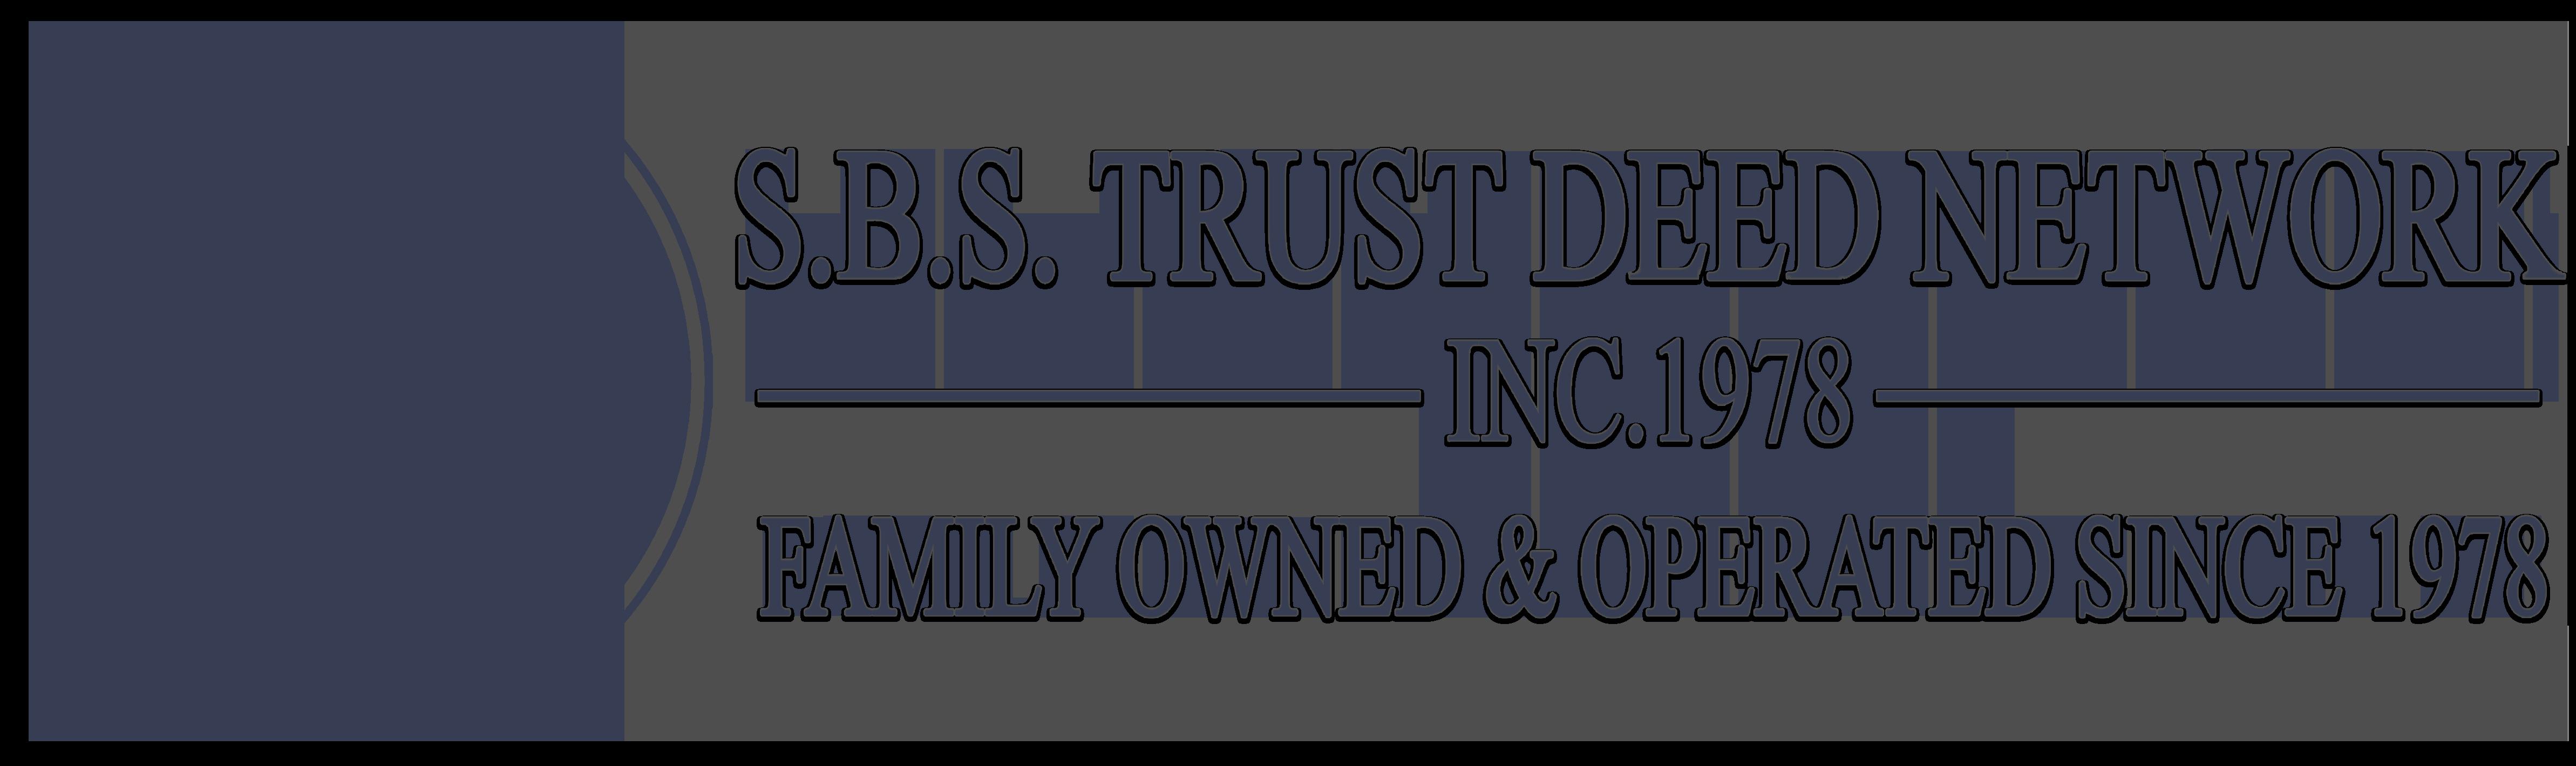 S.B.S. Trust Deed Network